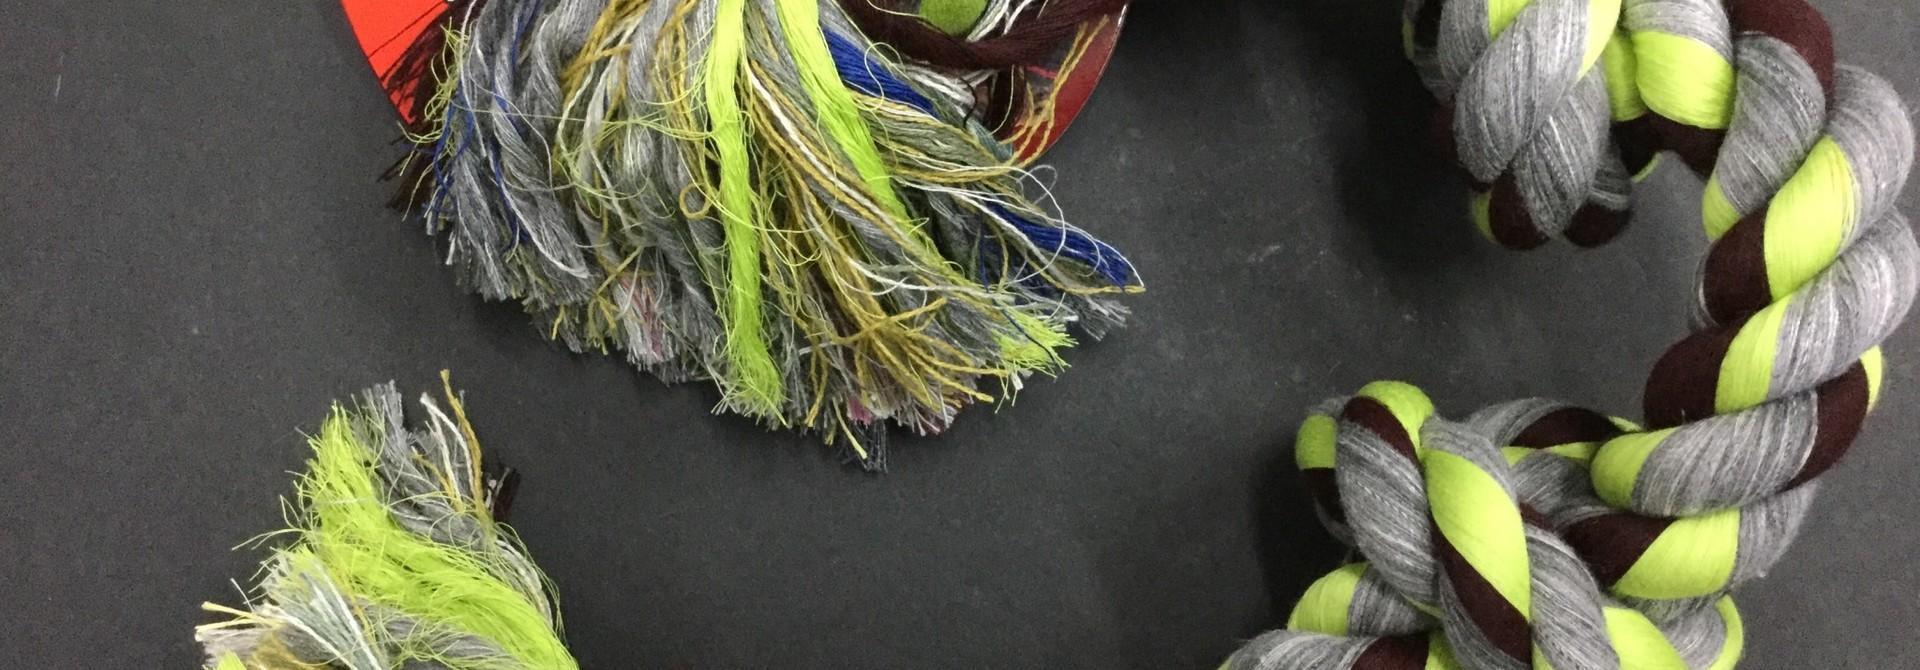 Cotton Tug 4 Knot Coloured XLarge 31